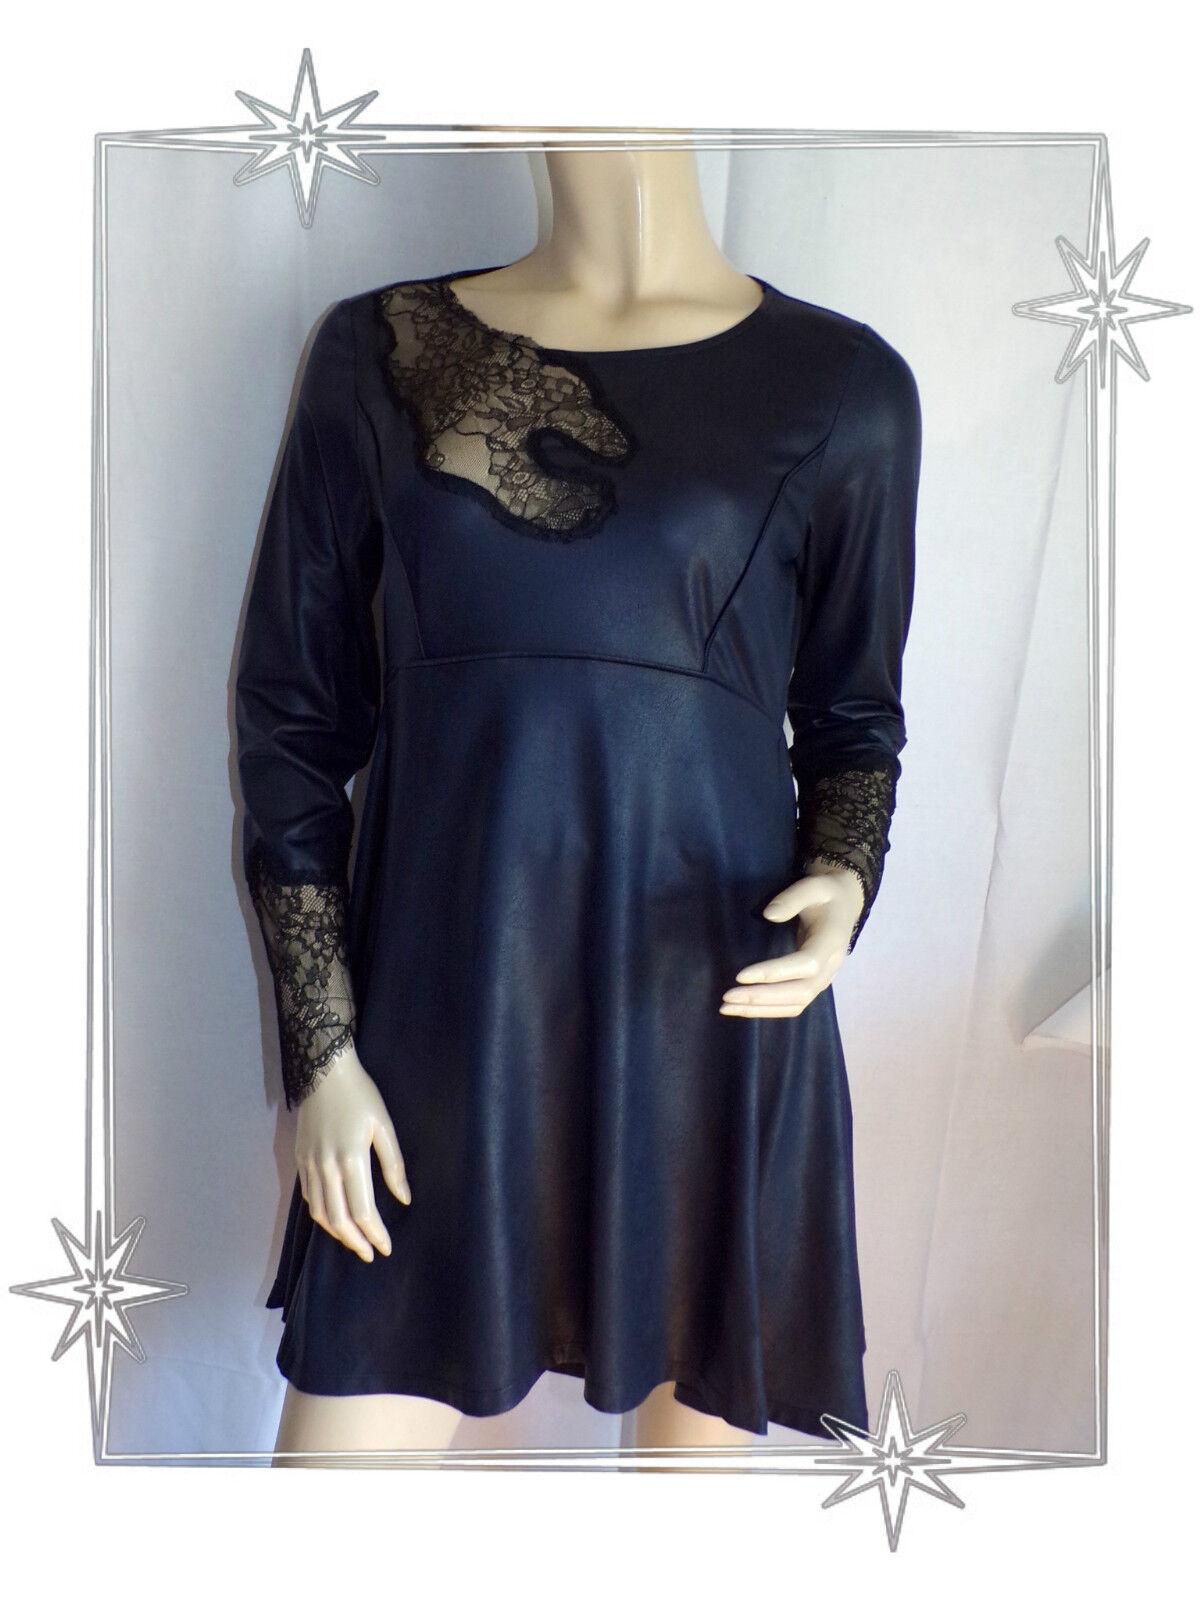 Schöne B Tunika-kleid Mitternachtsblau Spitze Mod. Wang Lauren Vidal Größe 38